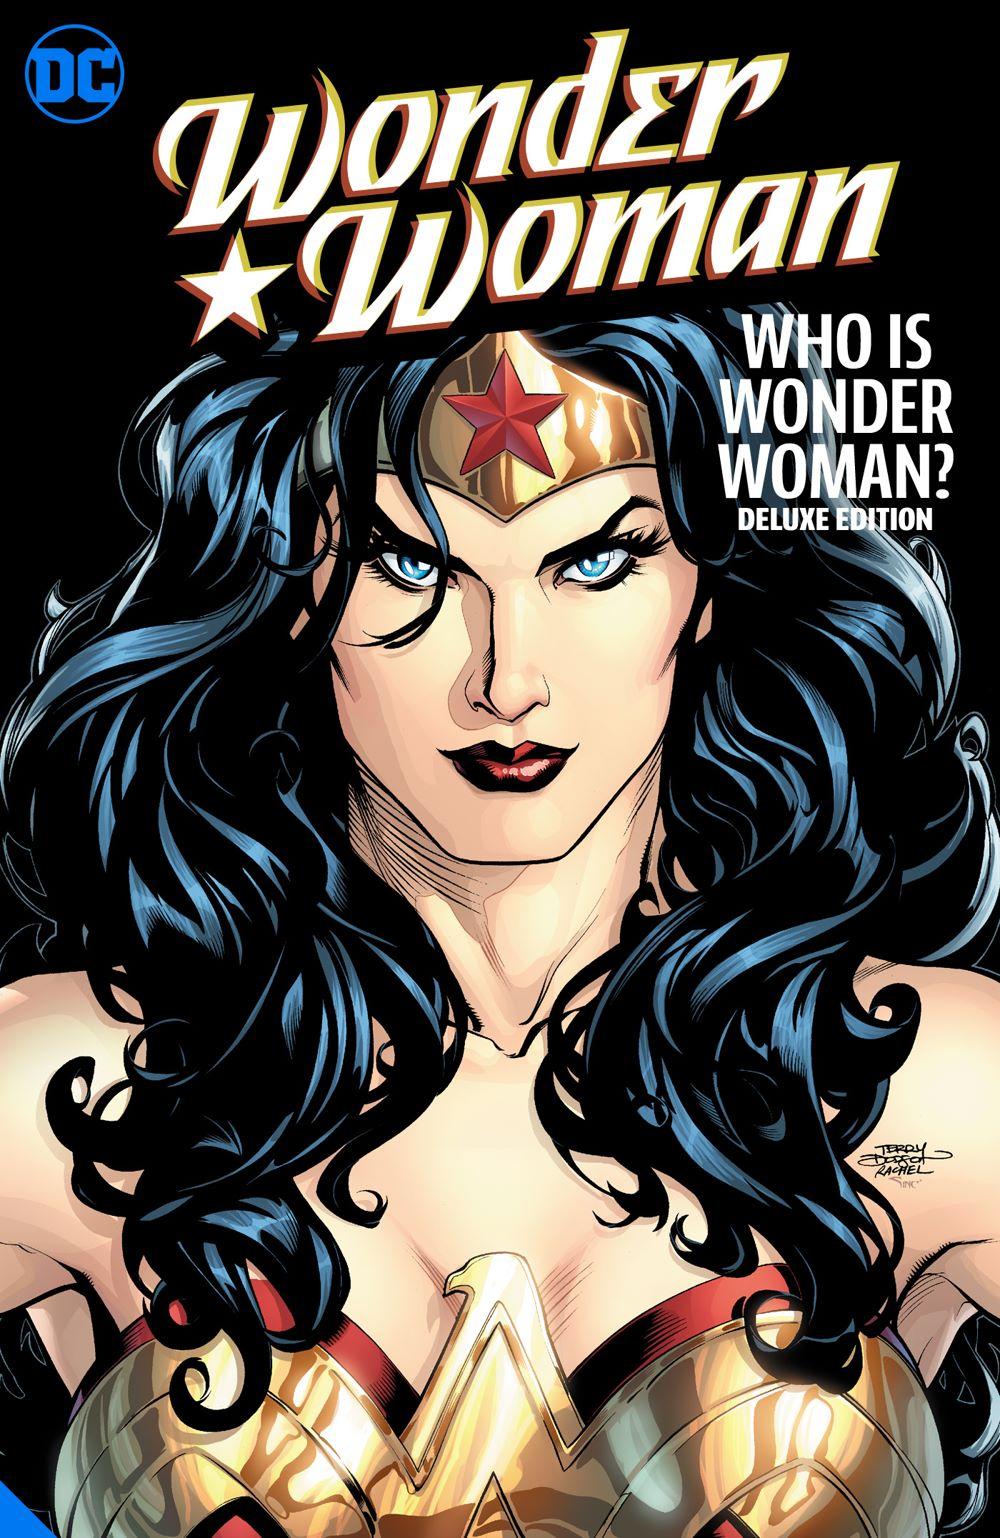 wonderwomanwhoiswonderwoman-dlx_adv DC Comics August 2021 Solicitations